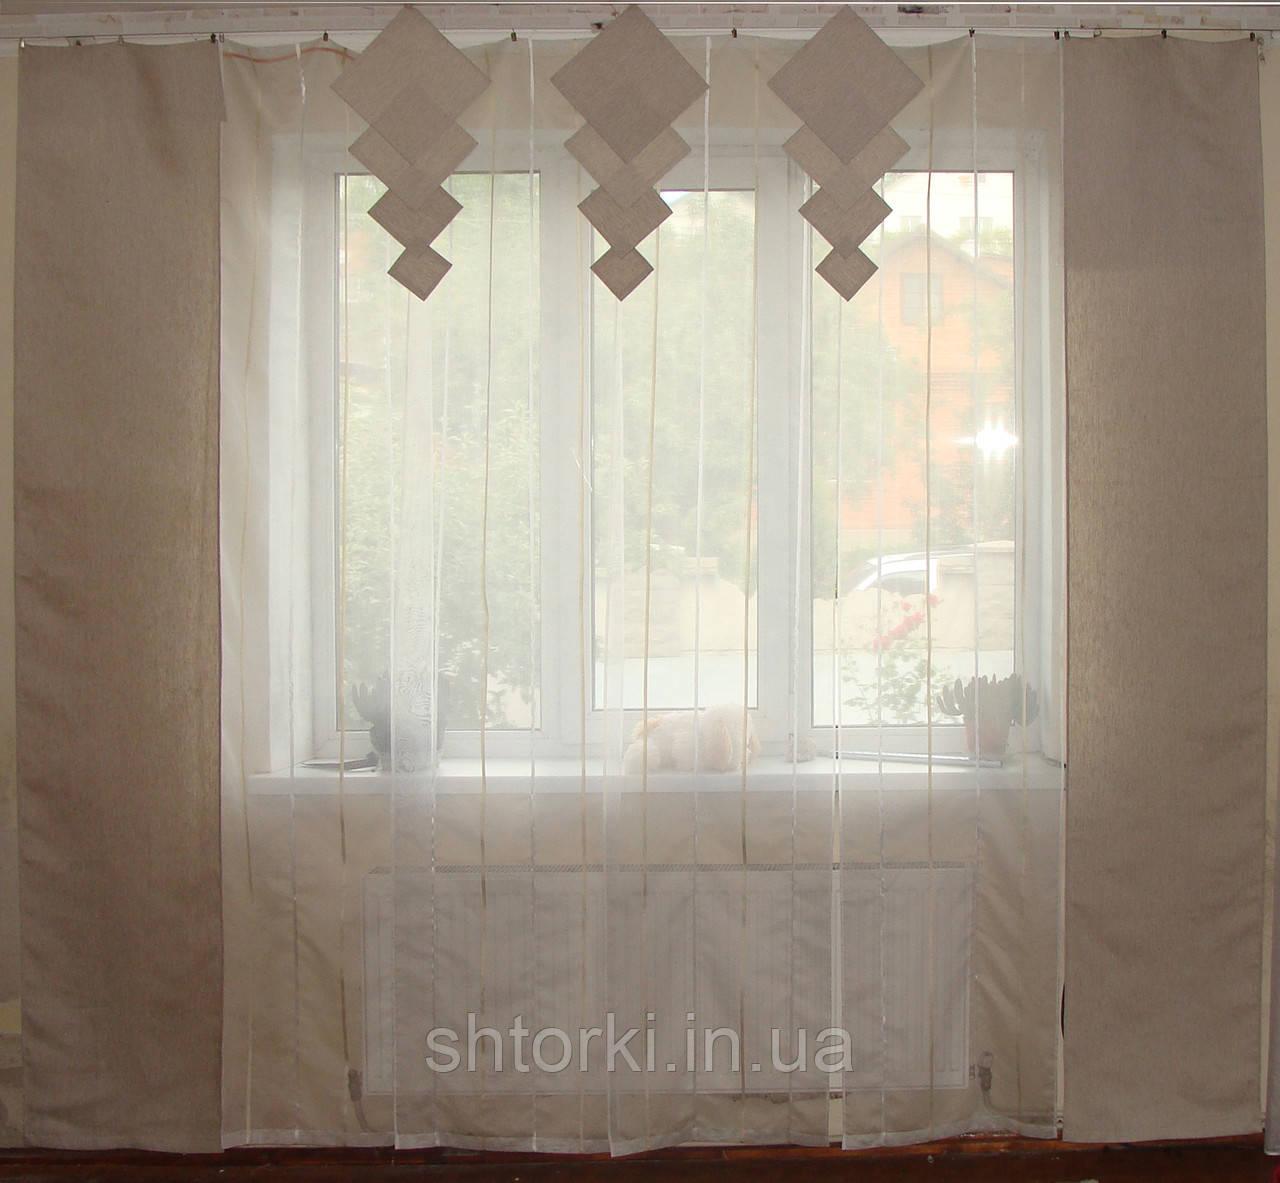 Комплект панельних шторок нануралка молочна